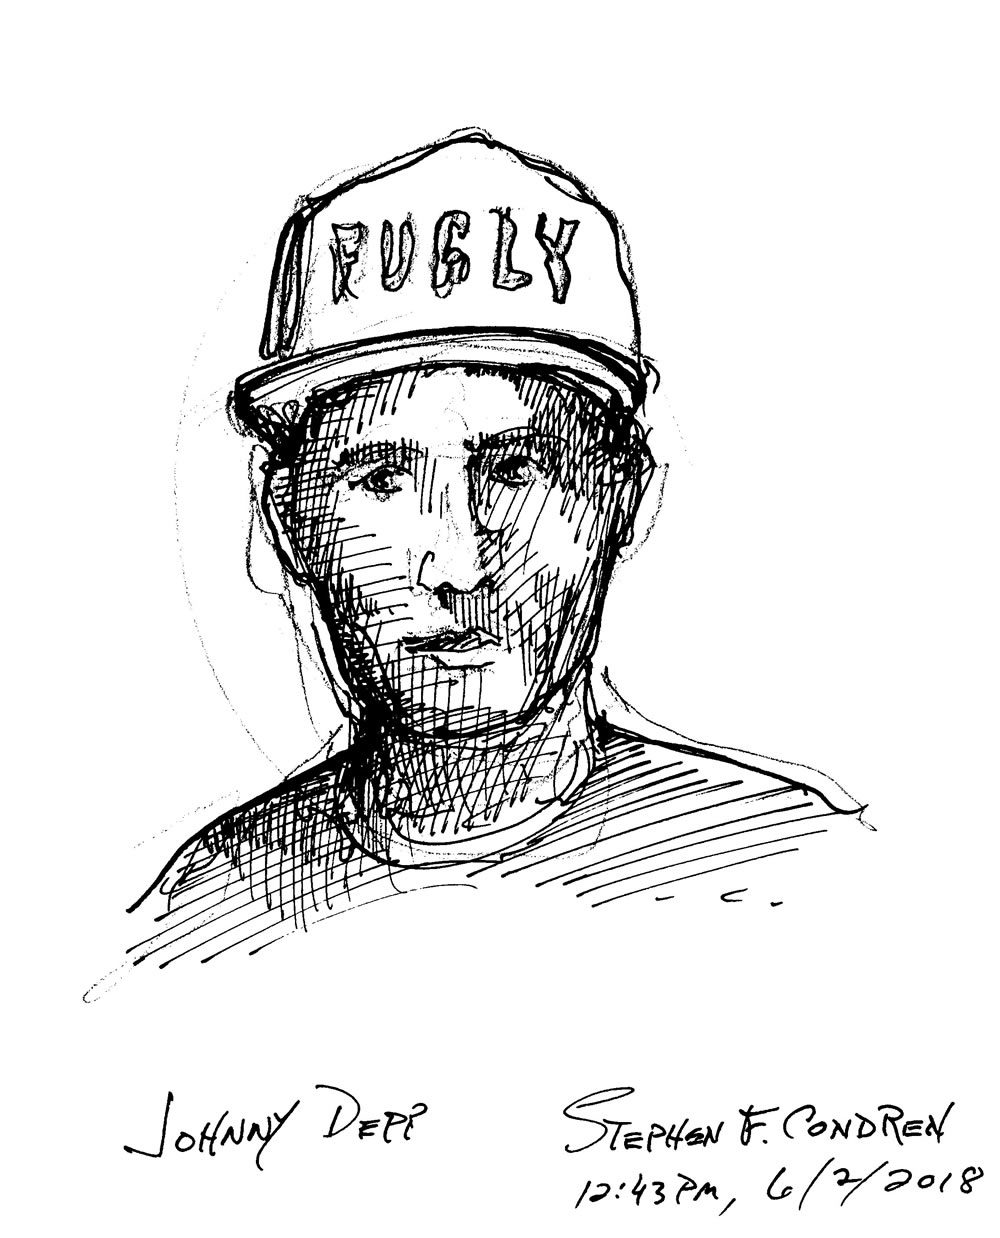 Johnny Depp celebrity art Pen & Ink Drawing By Stephen F. Condren